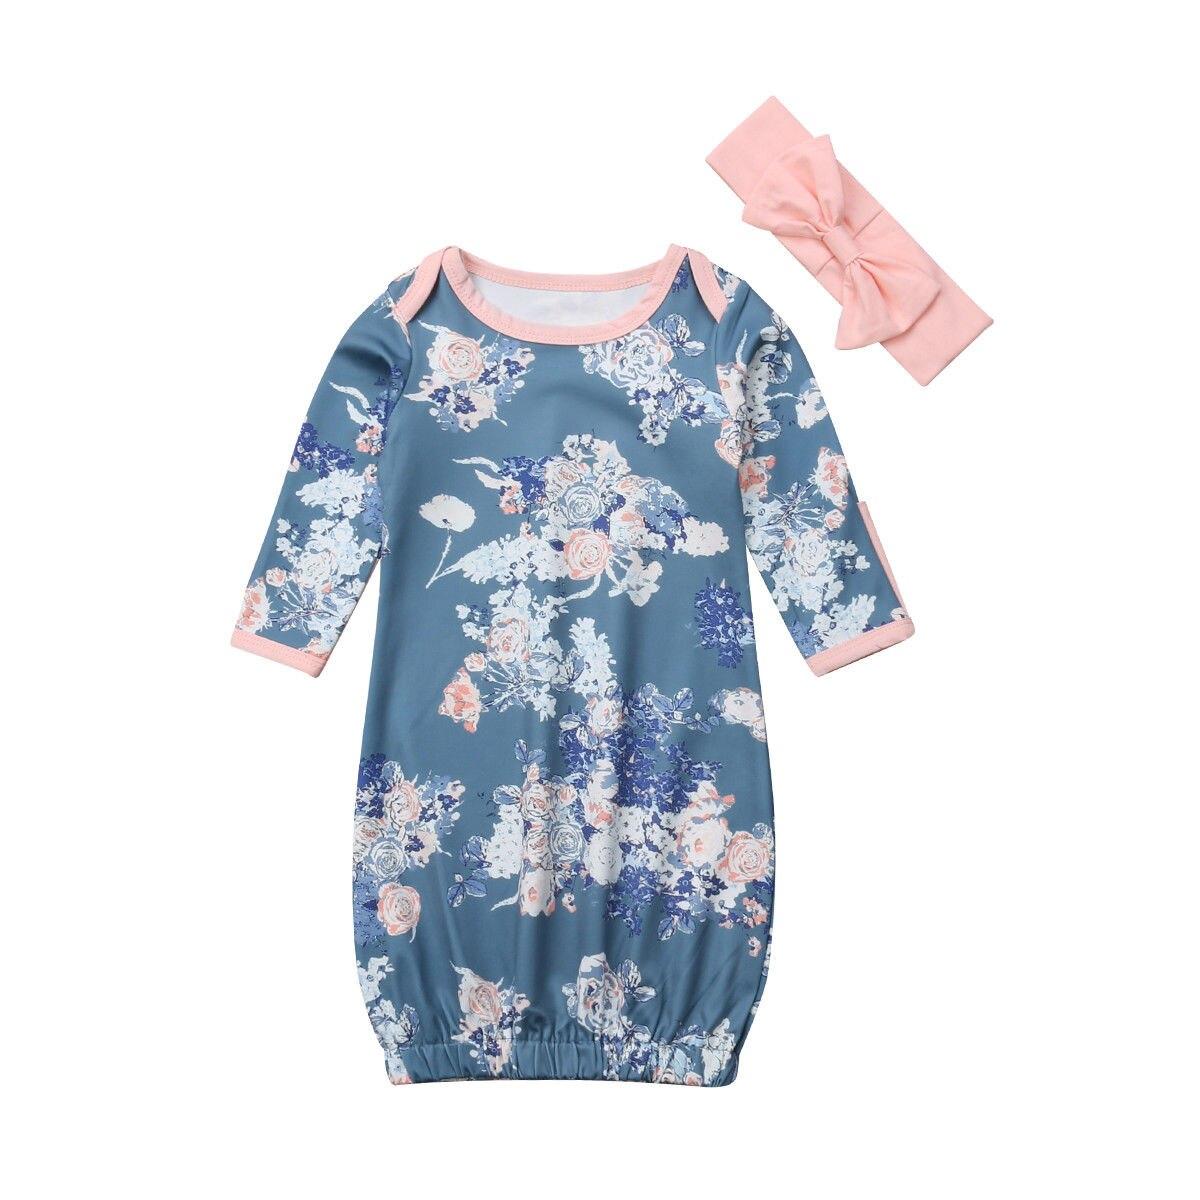 2018 Nieuwe Tollder Kid Babykleding Baby Zachte Inbakeren Wrap Deken Slapen Mousseline Wrap Hoofdband Set Fashion Print Mooie Wilde